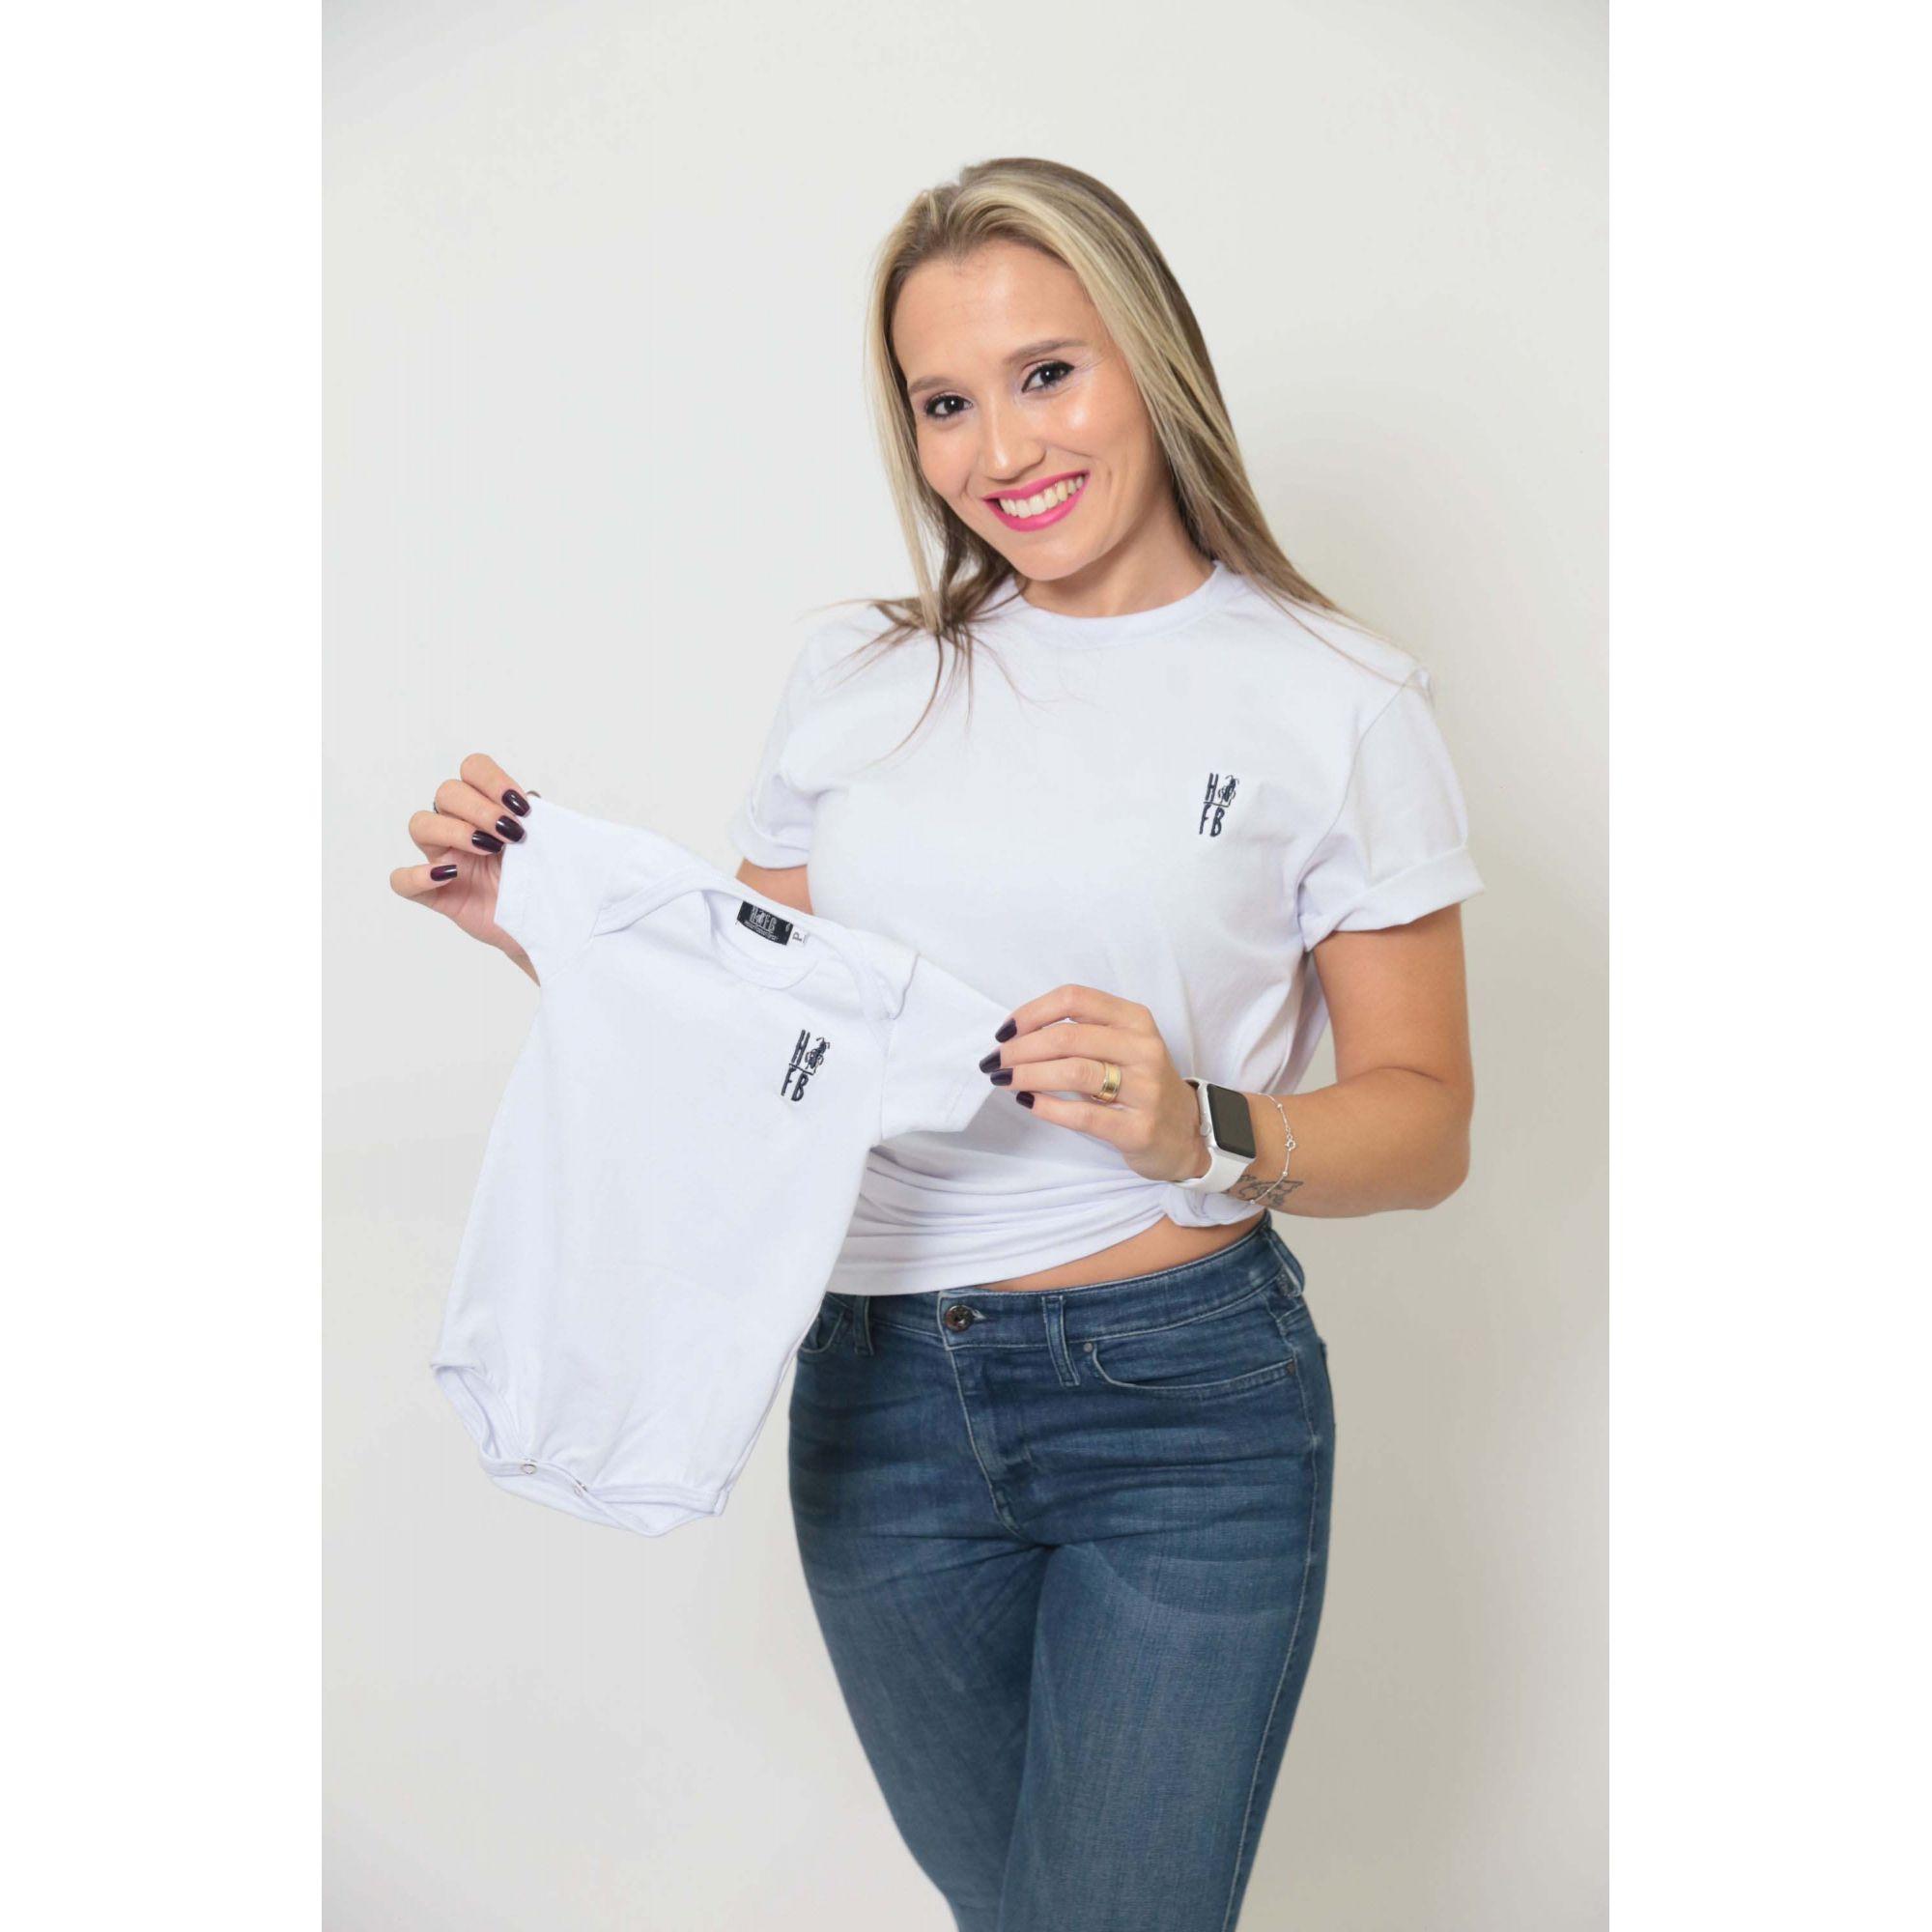 MÃE E FILHO > Kit 02 Peças T-Shirts - Branca [Coleção Tal Mãe Tal Filho]  - Heitor Fashion Brazil